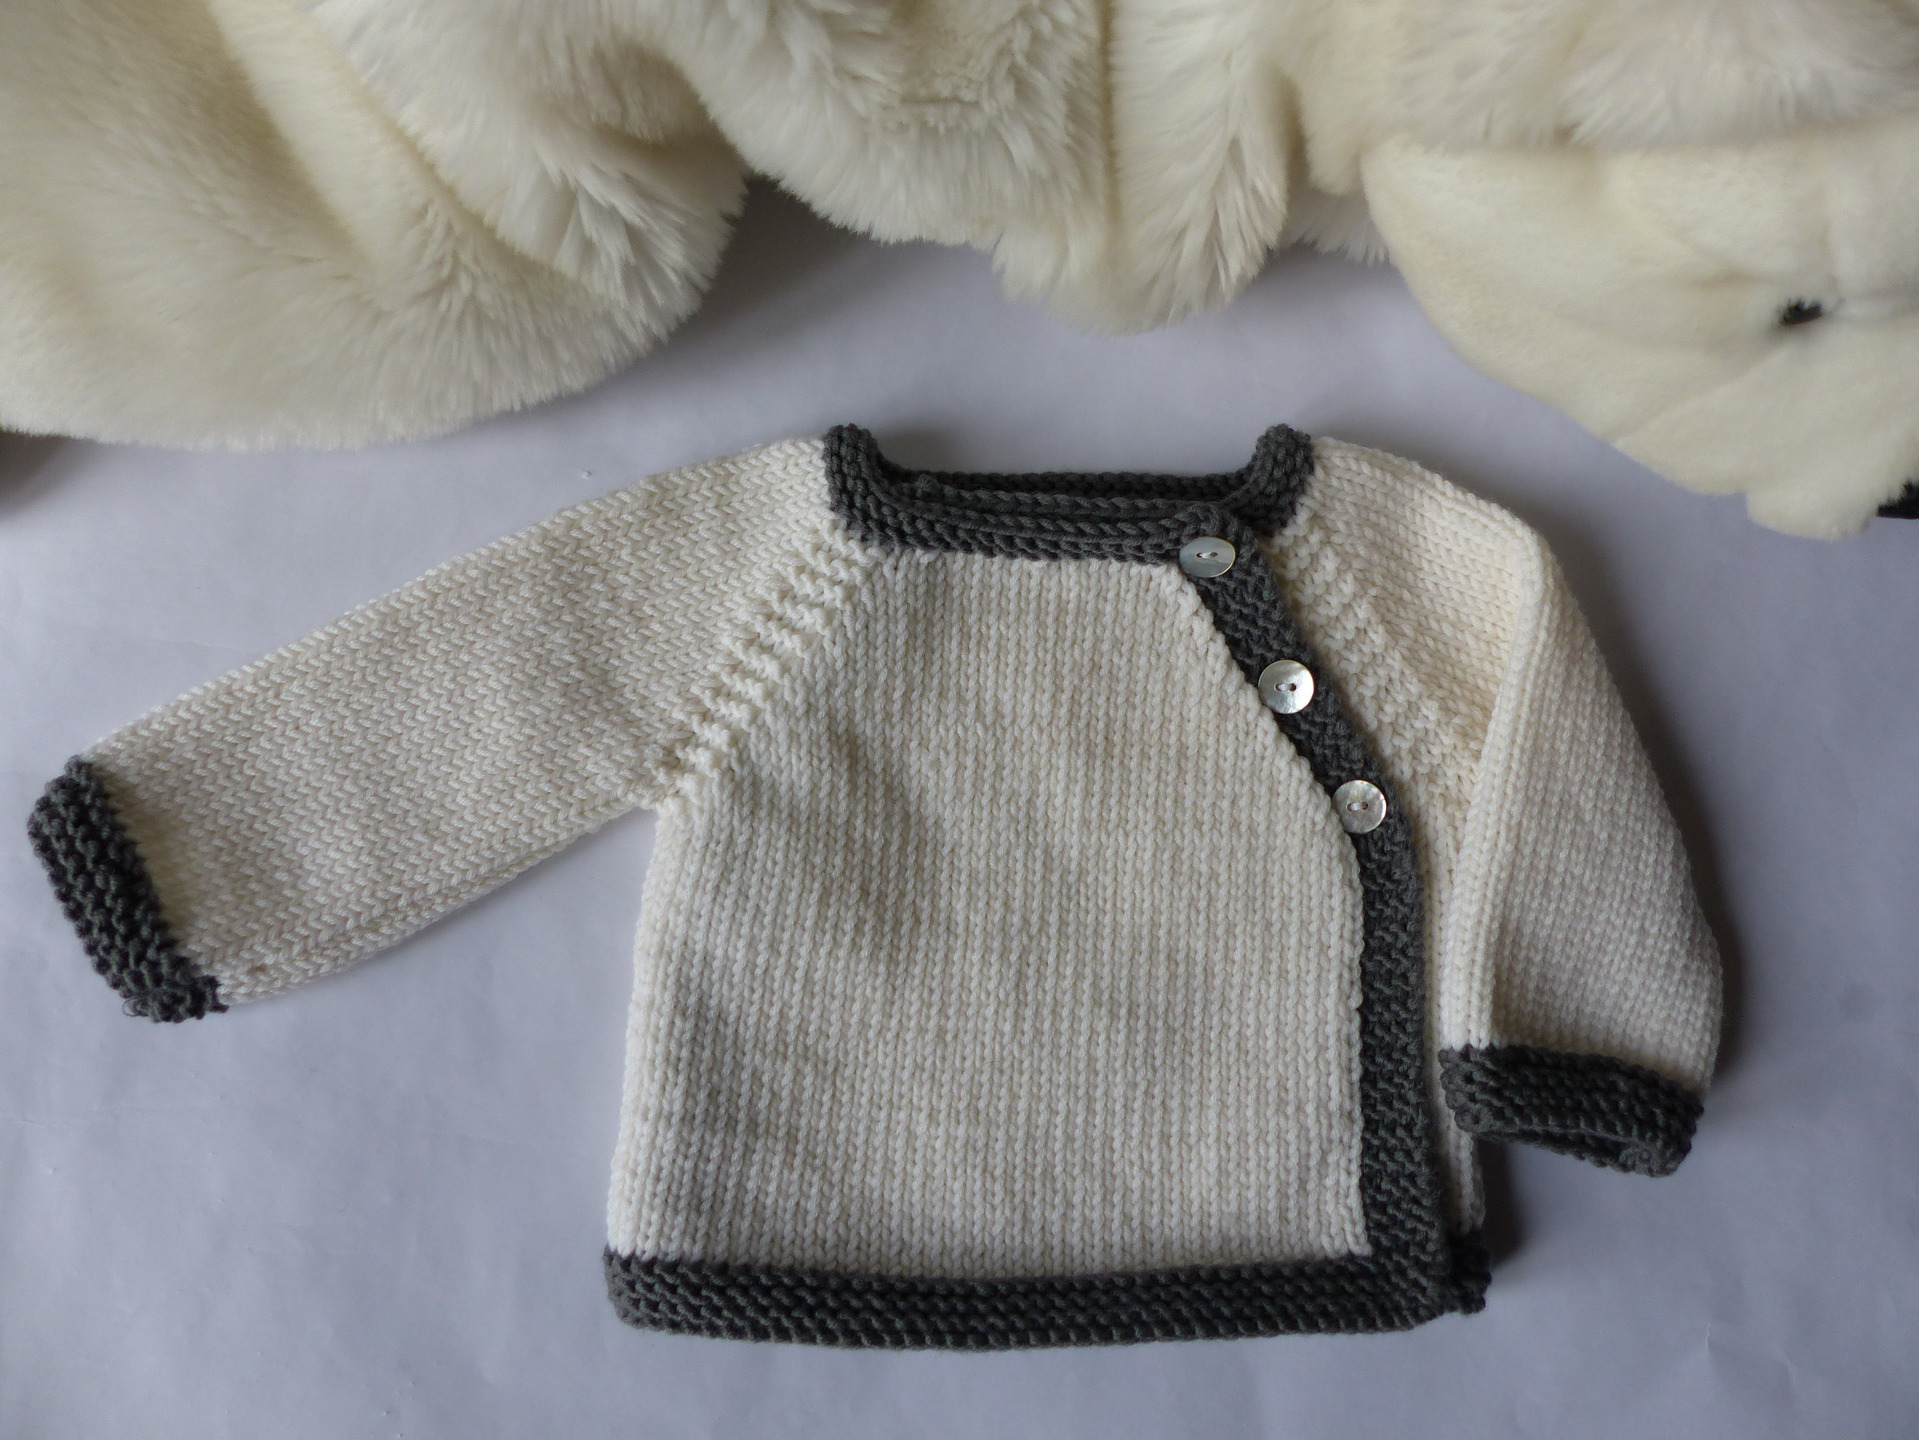 Apprendre tricoter brassiere bebe